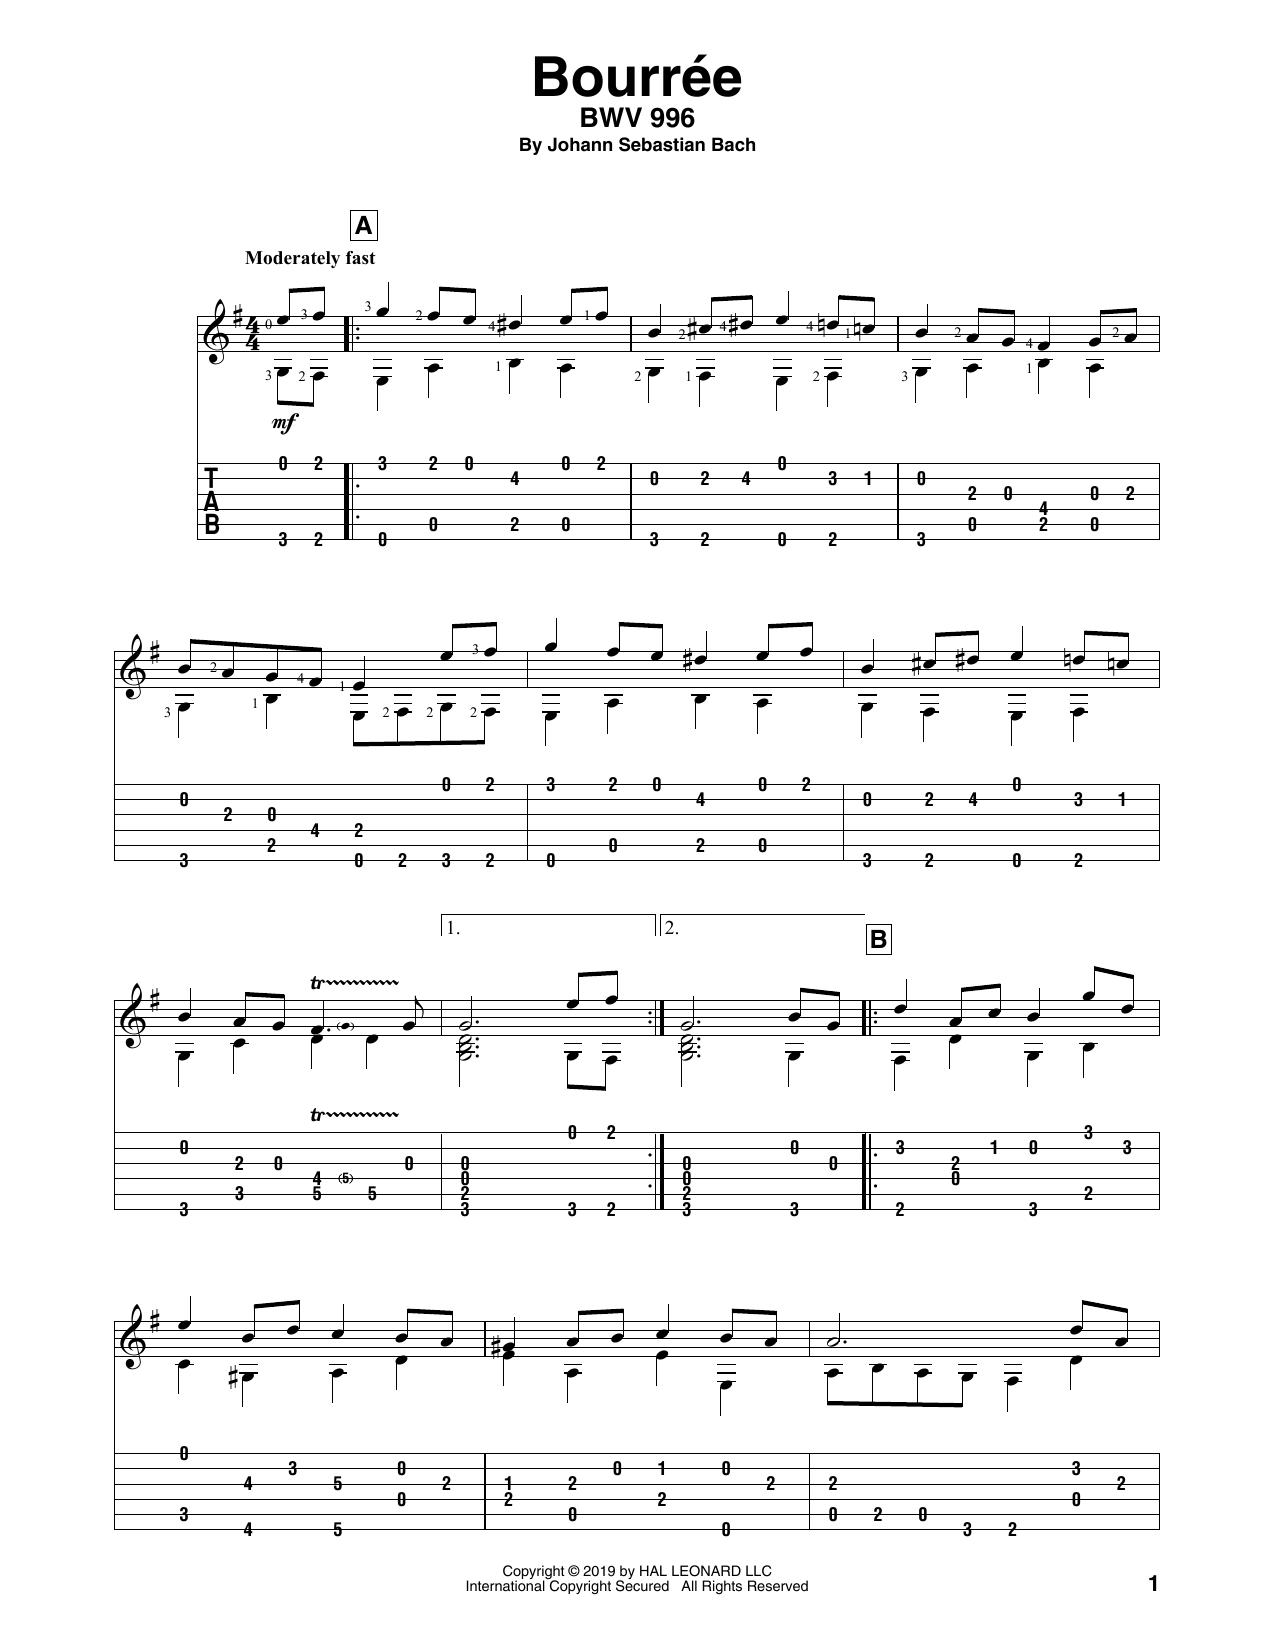 Johann Sebastian Bach Bouree sheet music notes and chords. Download Printable PDF.